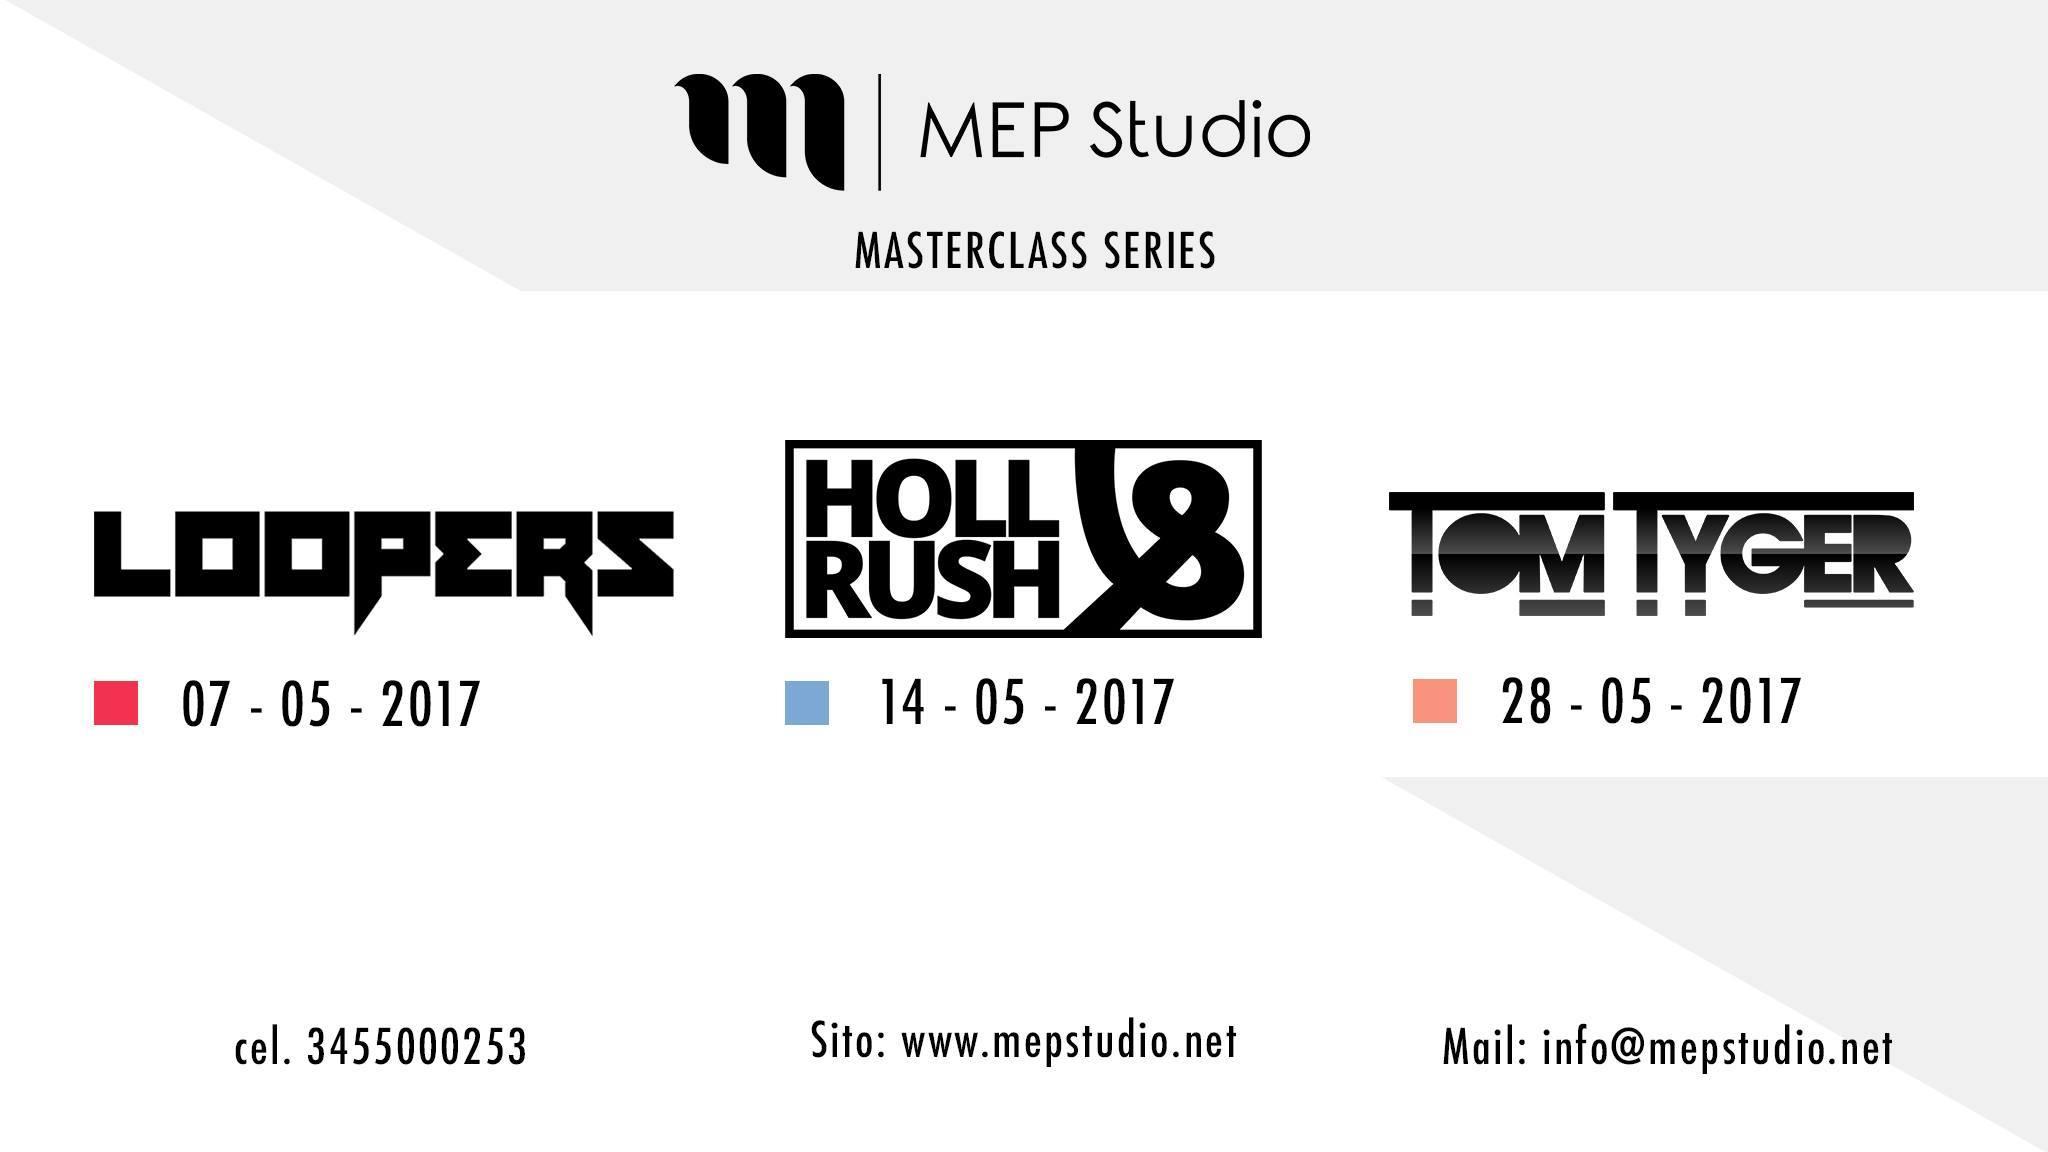 MEP Studio - Masterclass